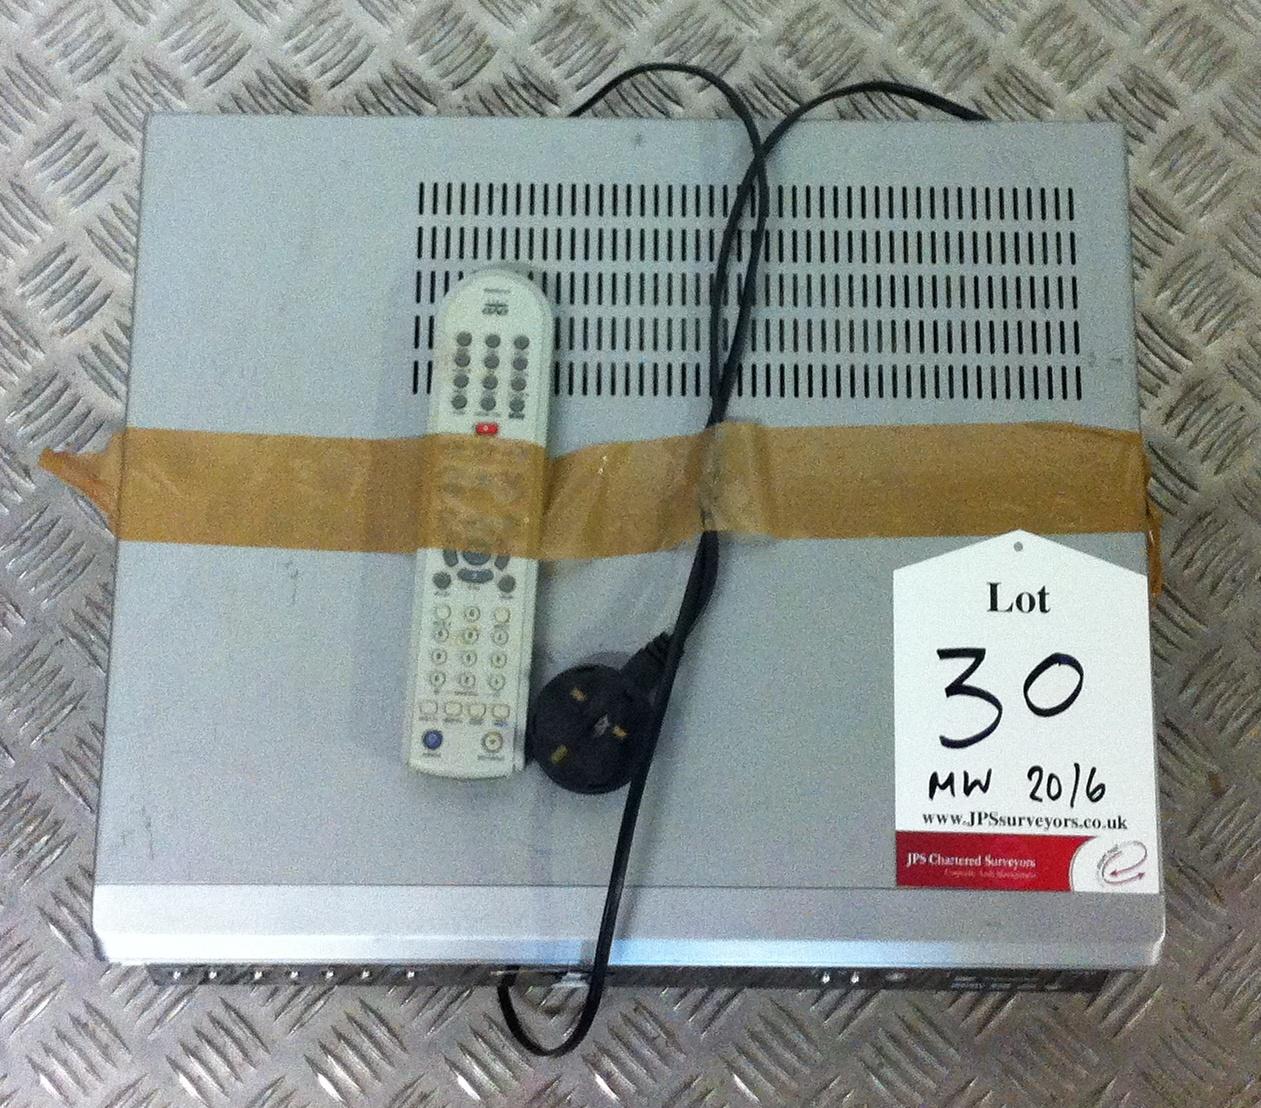 Lot 30 - Bush Video/DVD Recorder